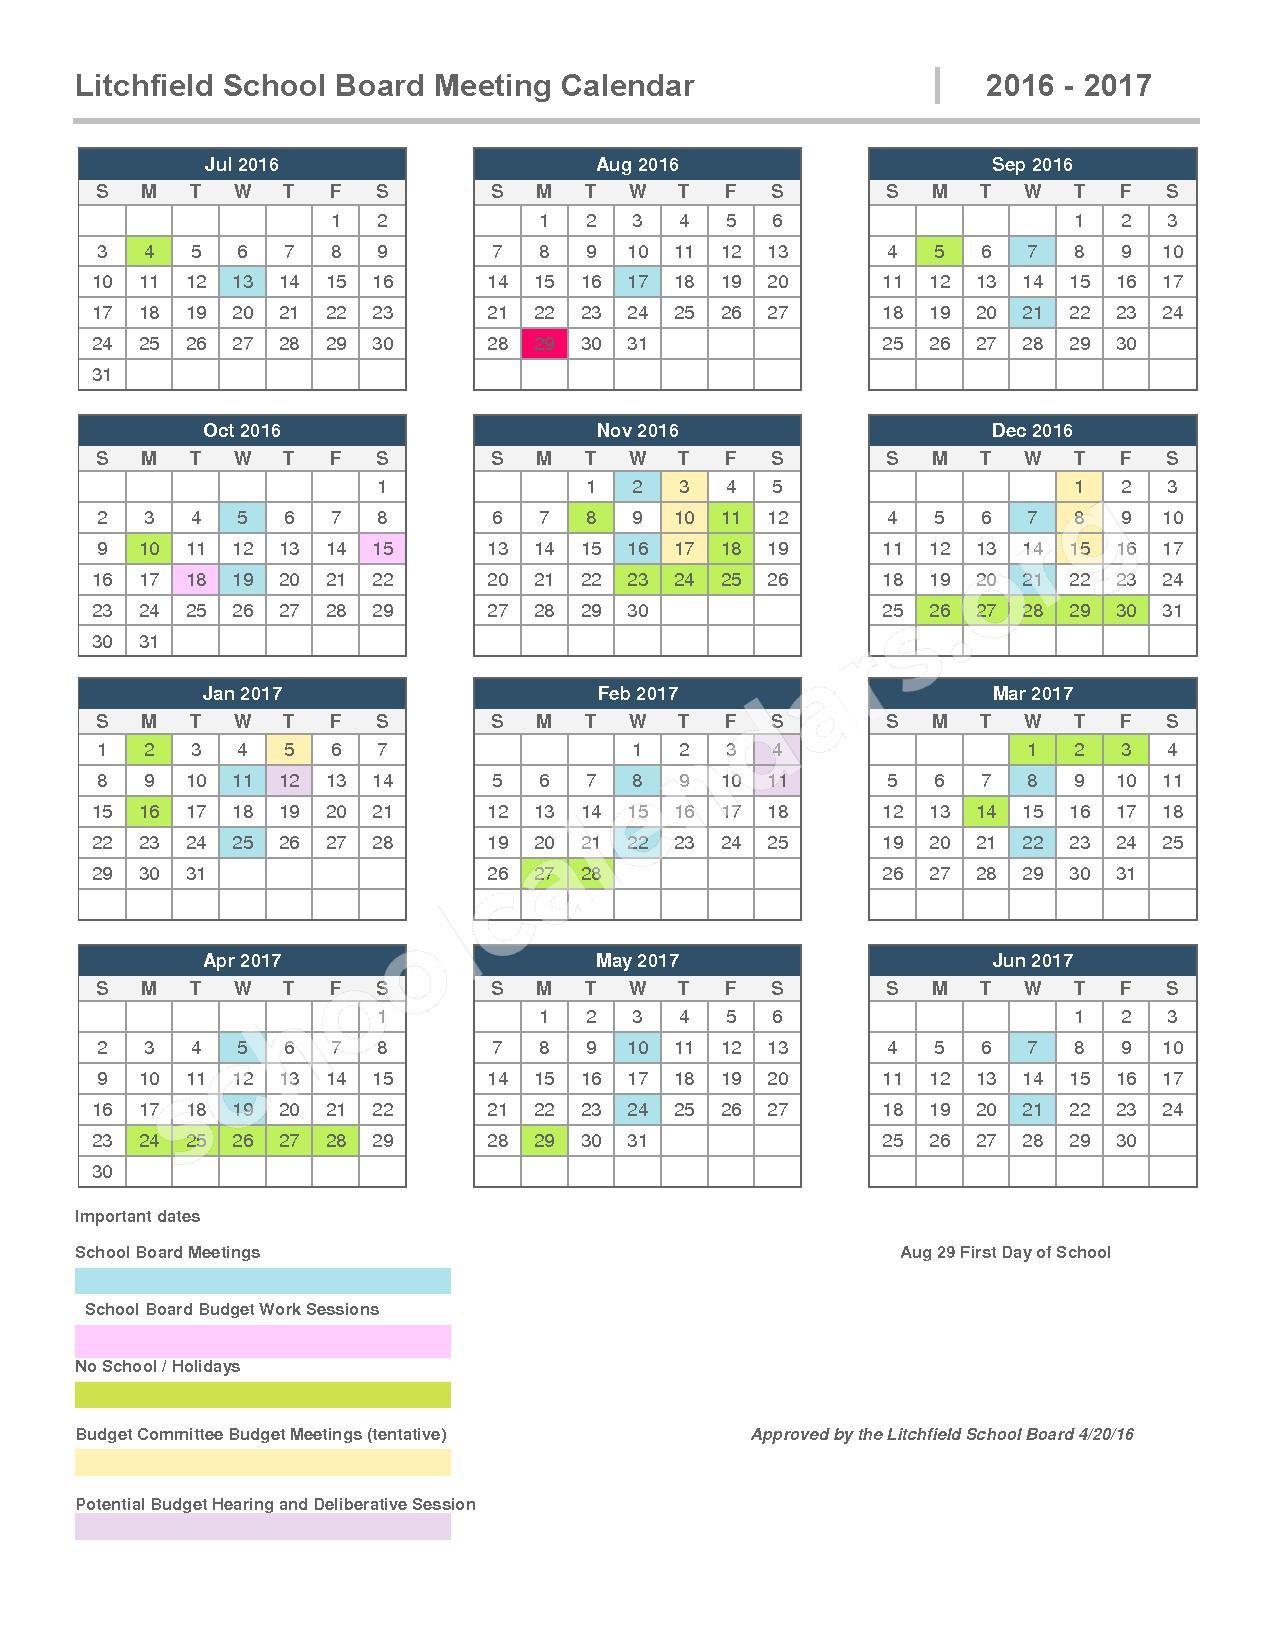 2016 - 2017 School Board Meeting Calendar – SAU 27 - Litchfield School District – page 1